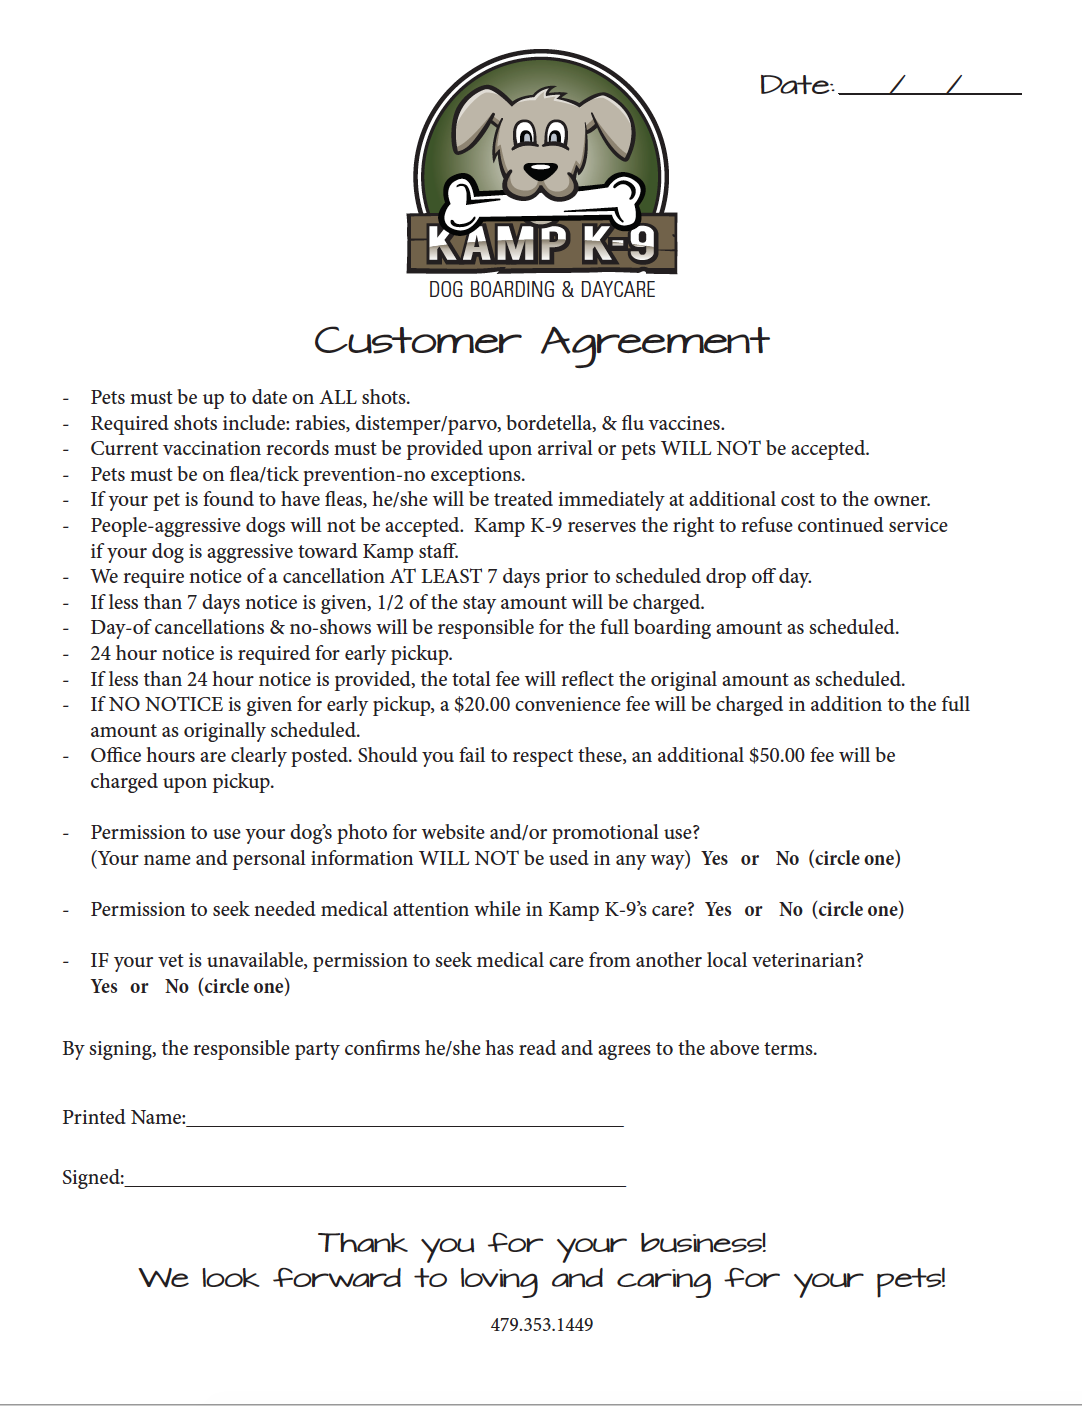 Customer Agreement Form